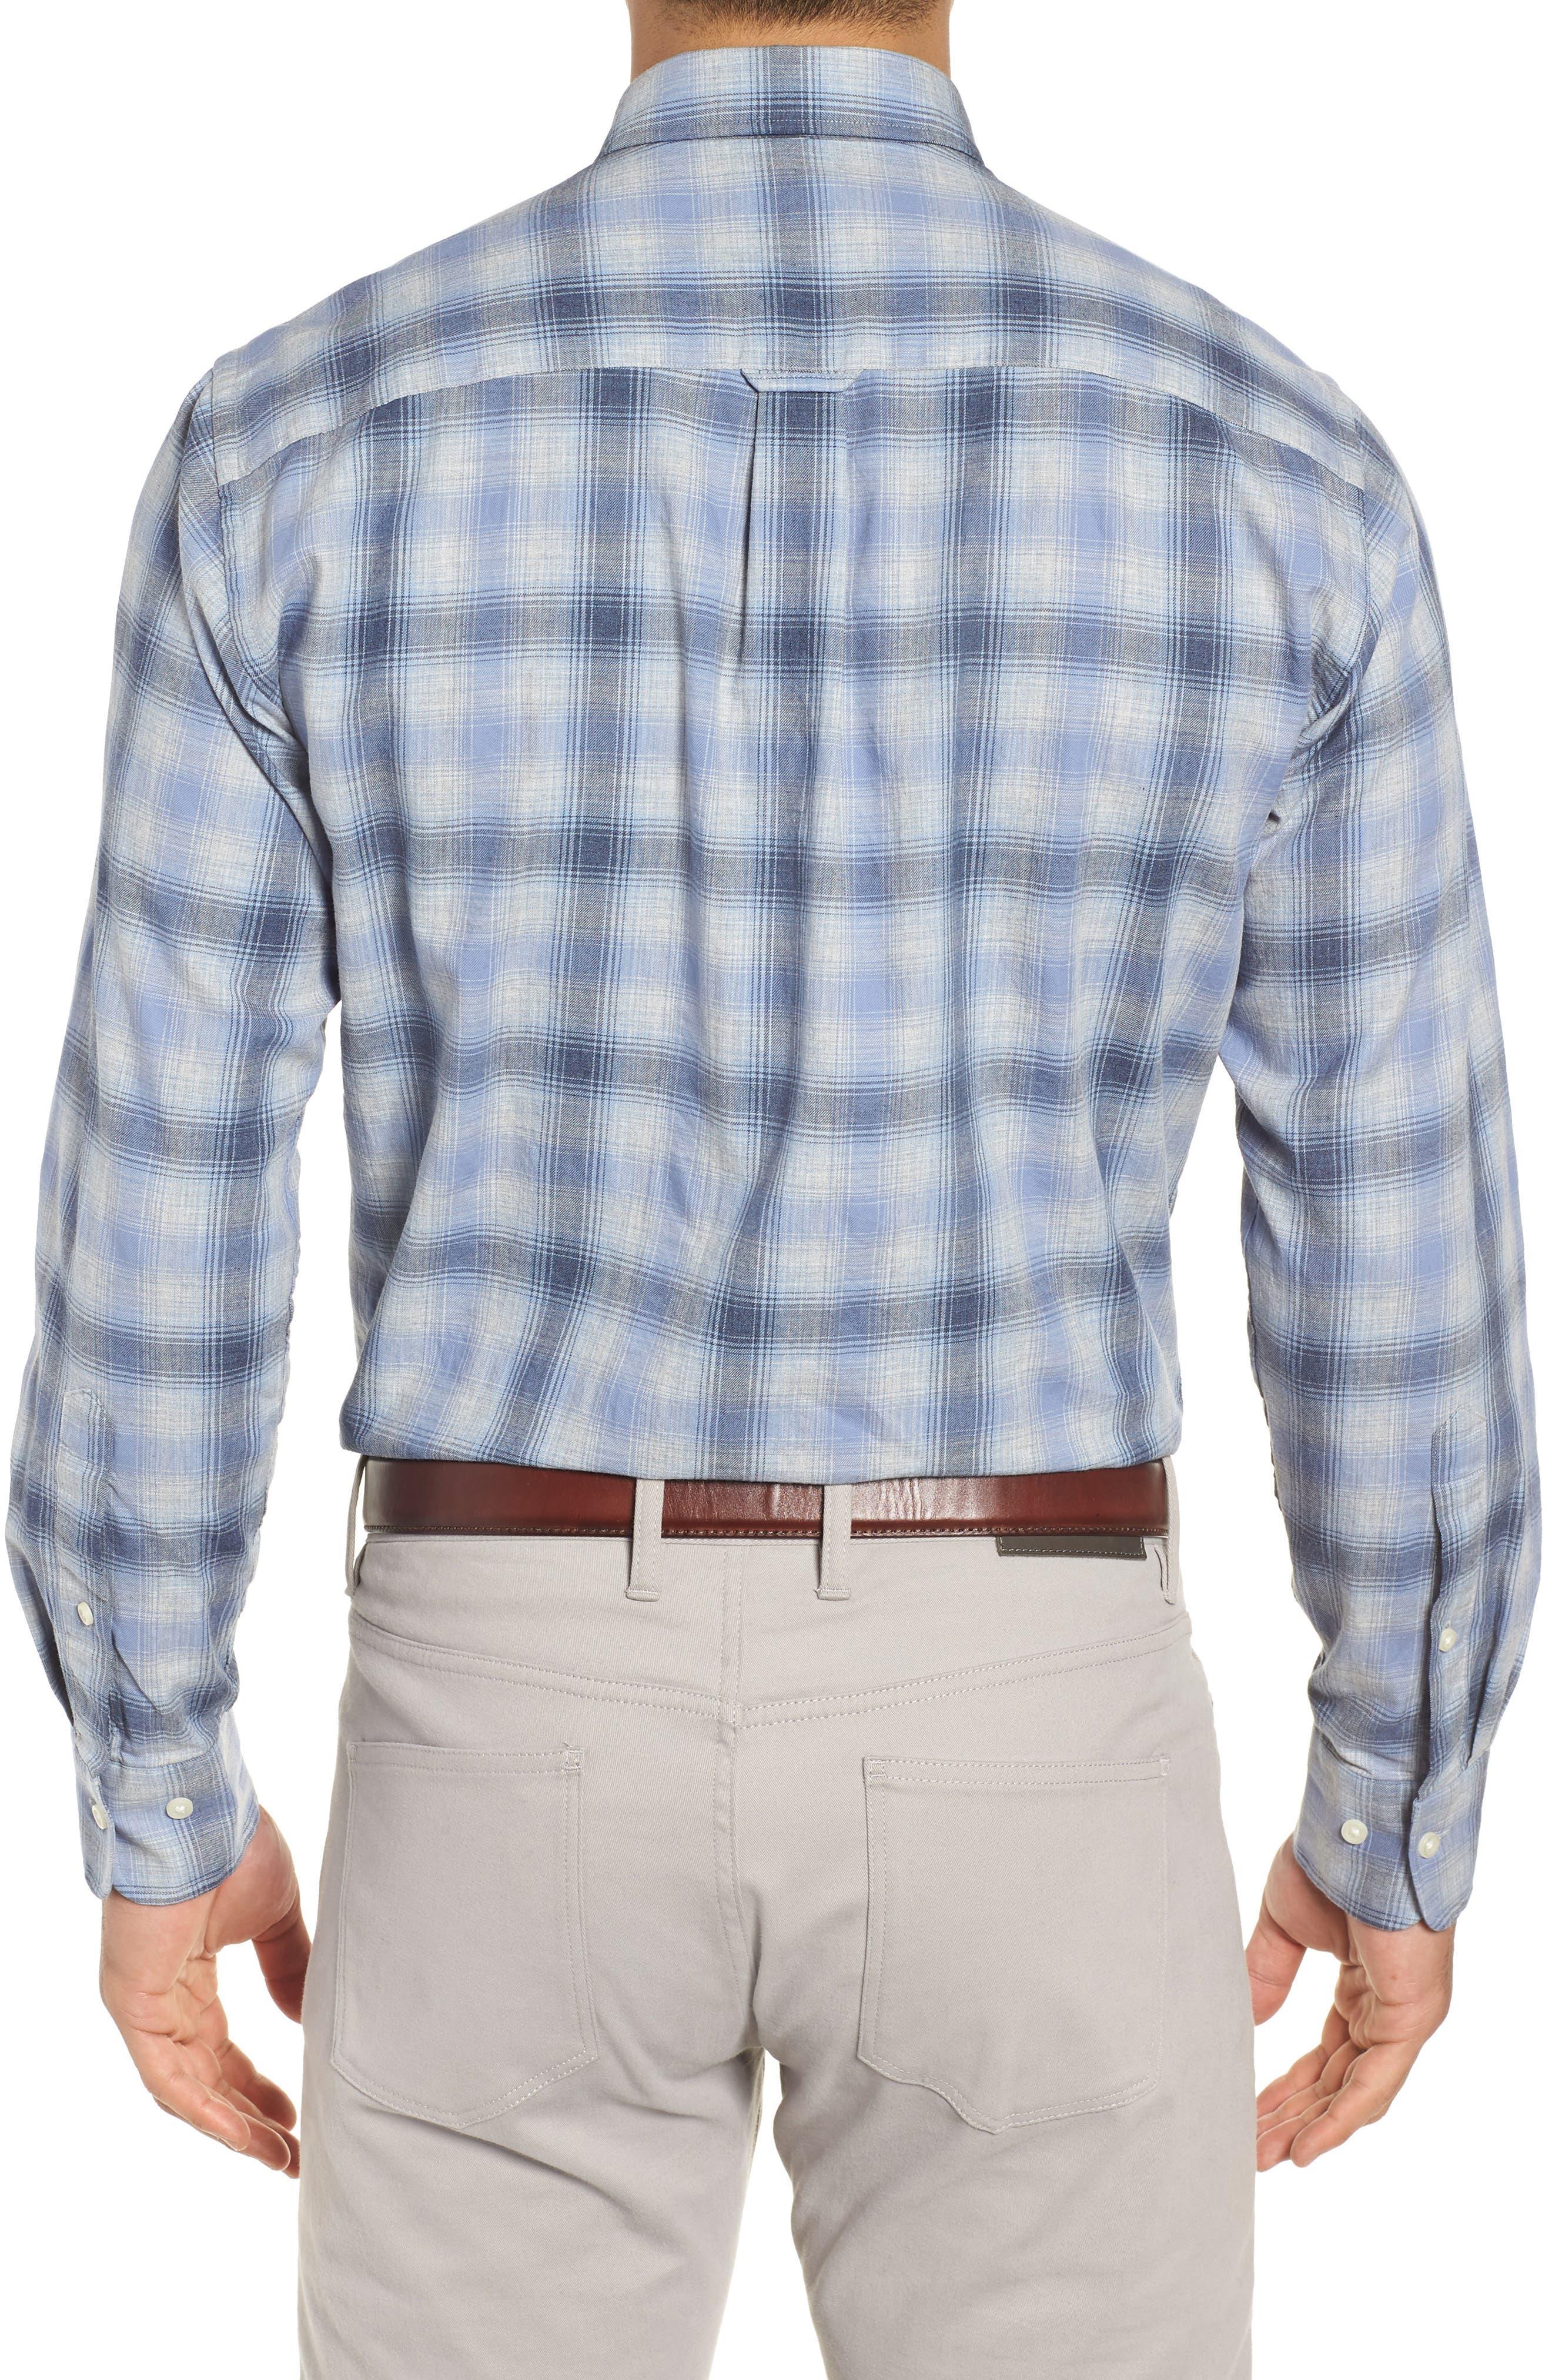 Mountain Fog Plaid Sport Shirt,                             Alternate thumbnail 3, color,                             ATLANTIC BLUE